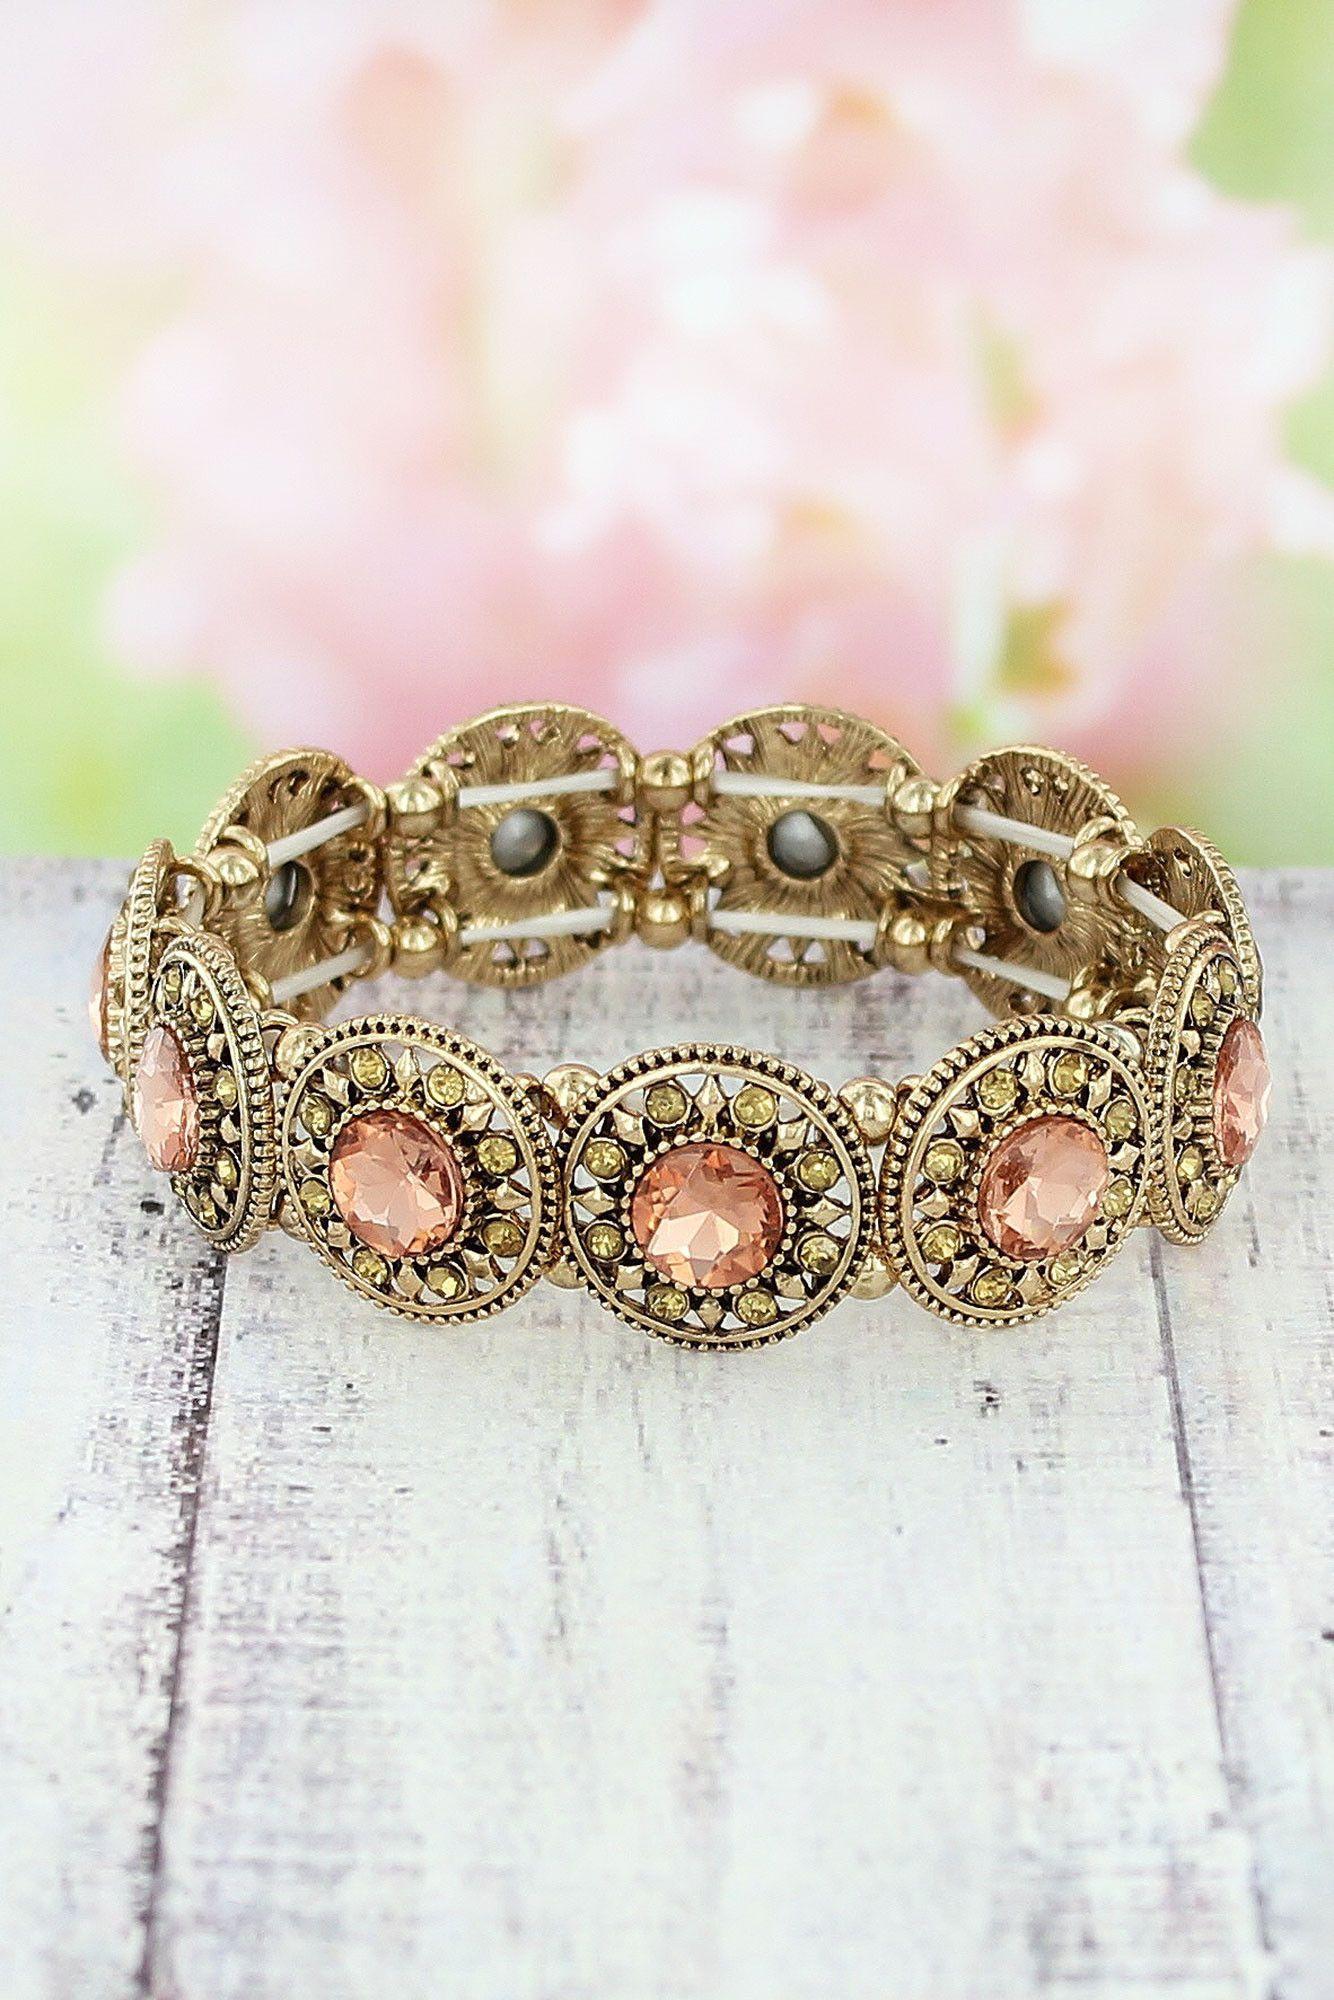 Peach Crystal and Antique Goldtone Disk Stretch Bracelet #VB0429-AGPCH